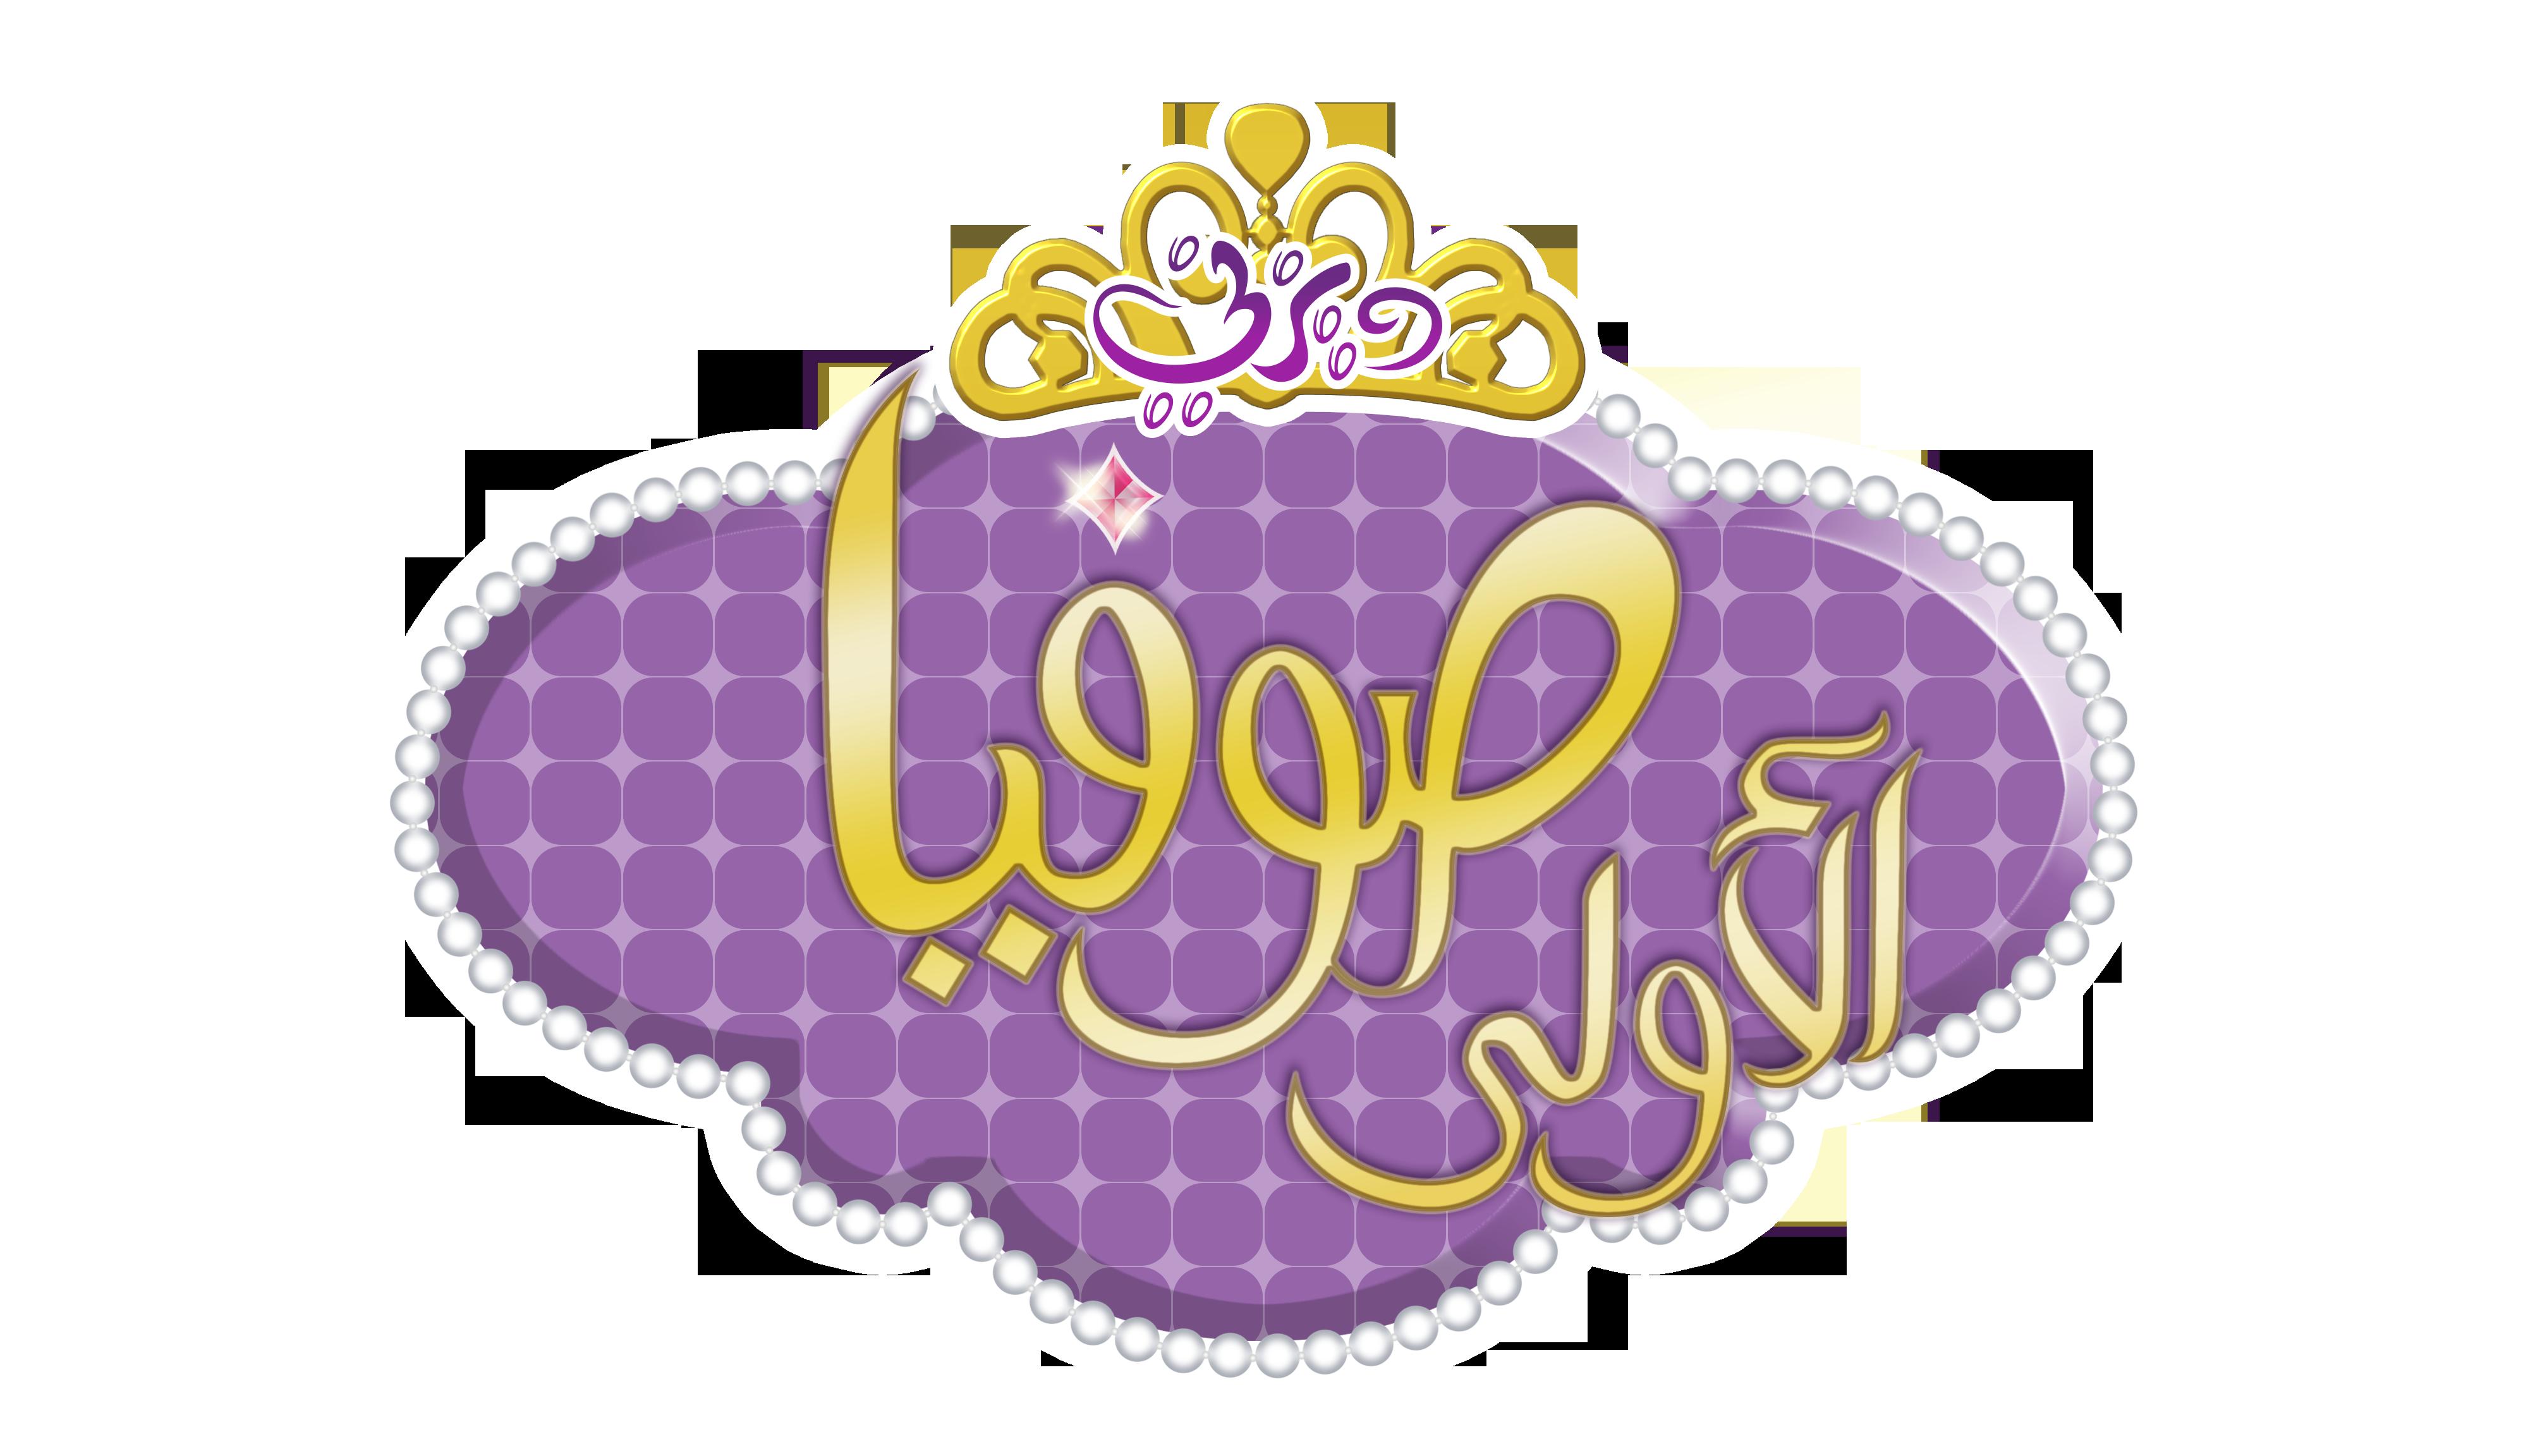 sofia the first logo font wwwpixsharkcom images